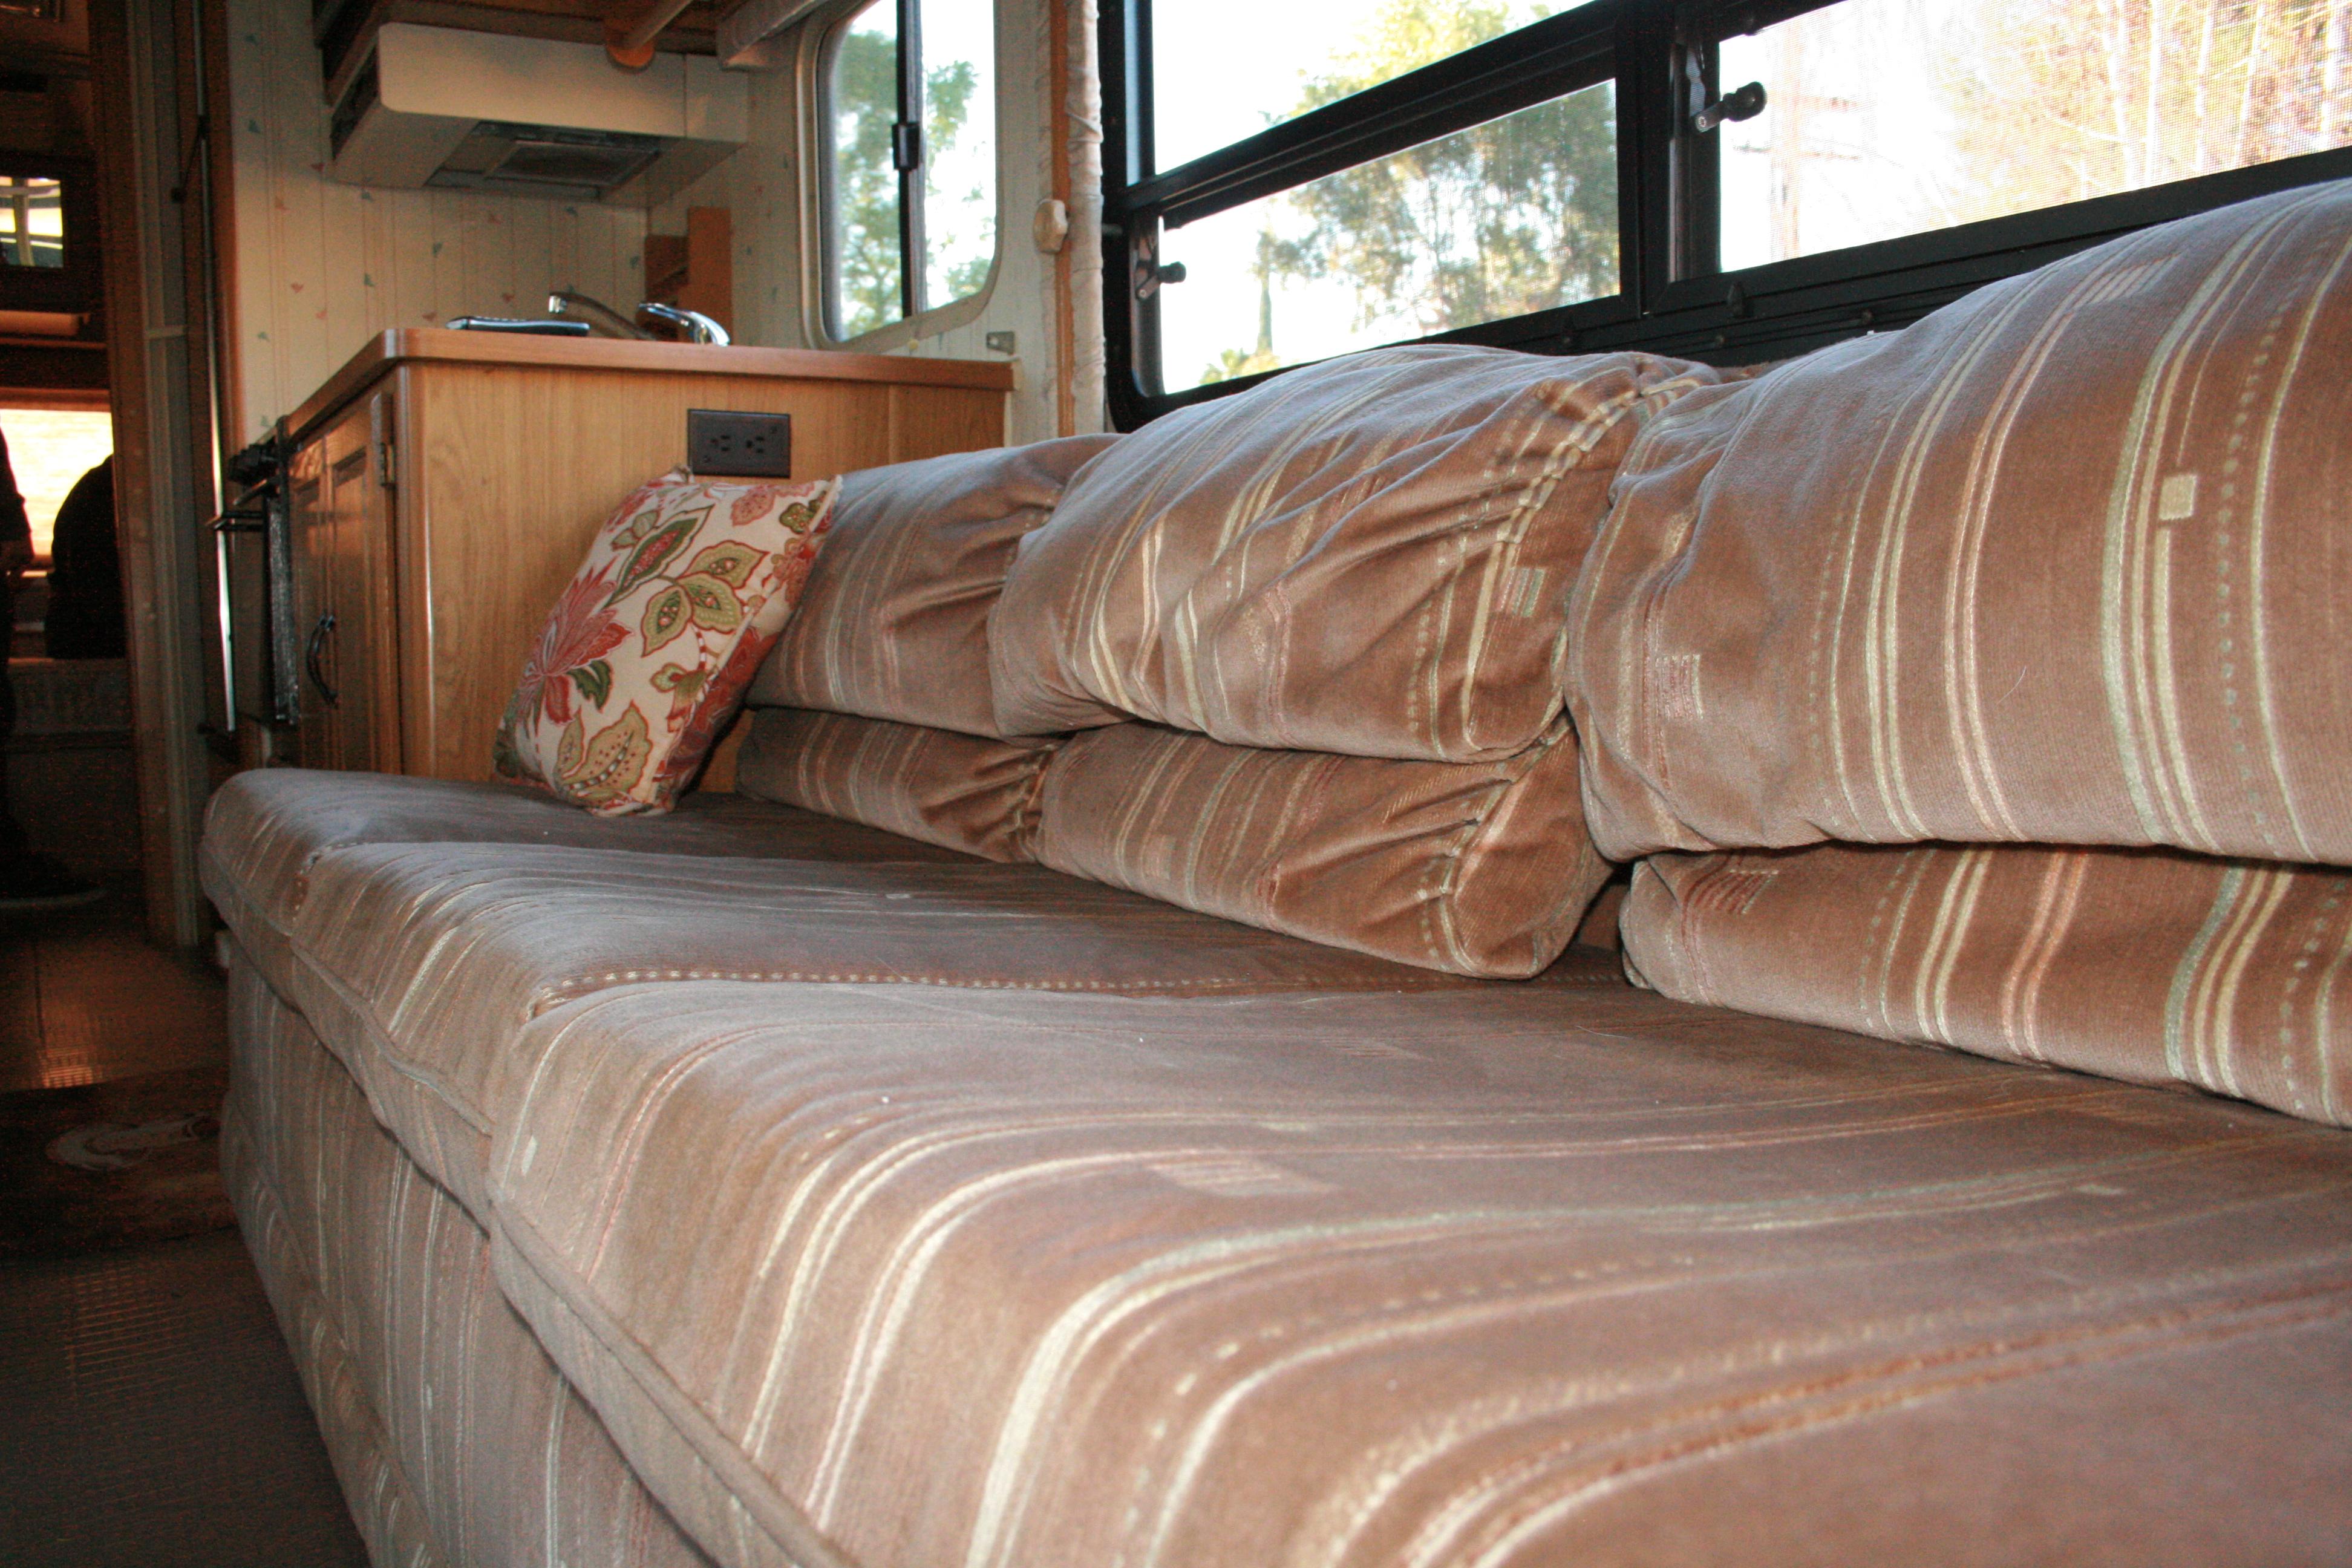 ■sofa bed Capably Diy Rv Sofa Bed Sofa With Bed Diy Rv Sofa